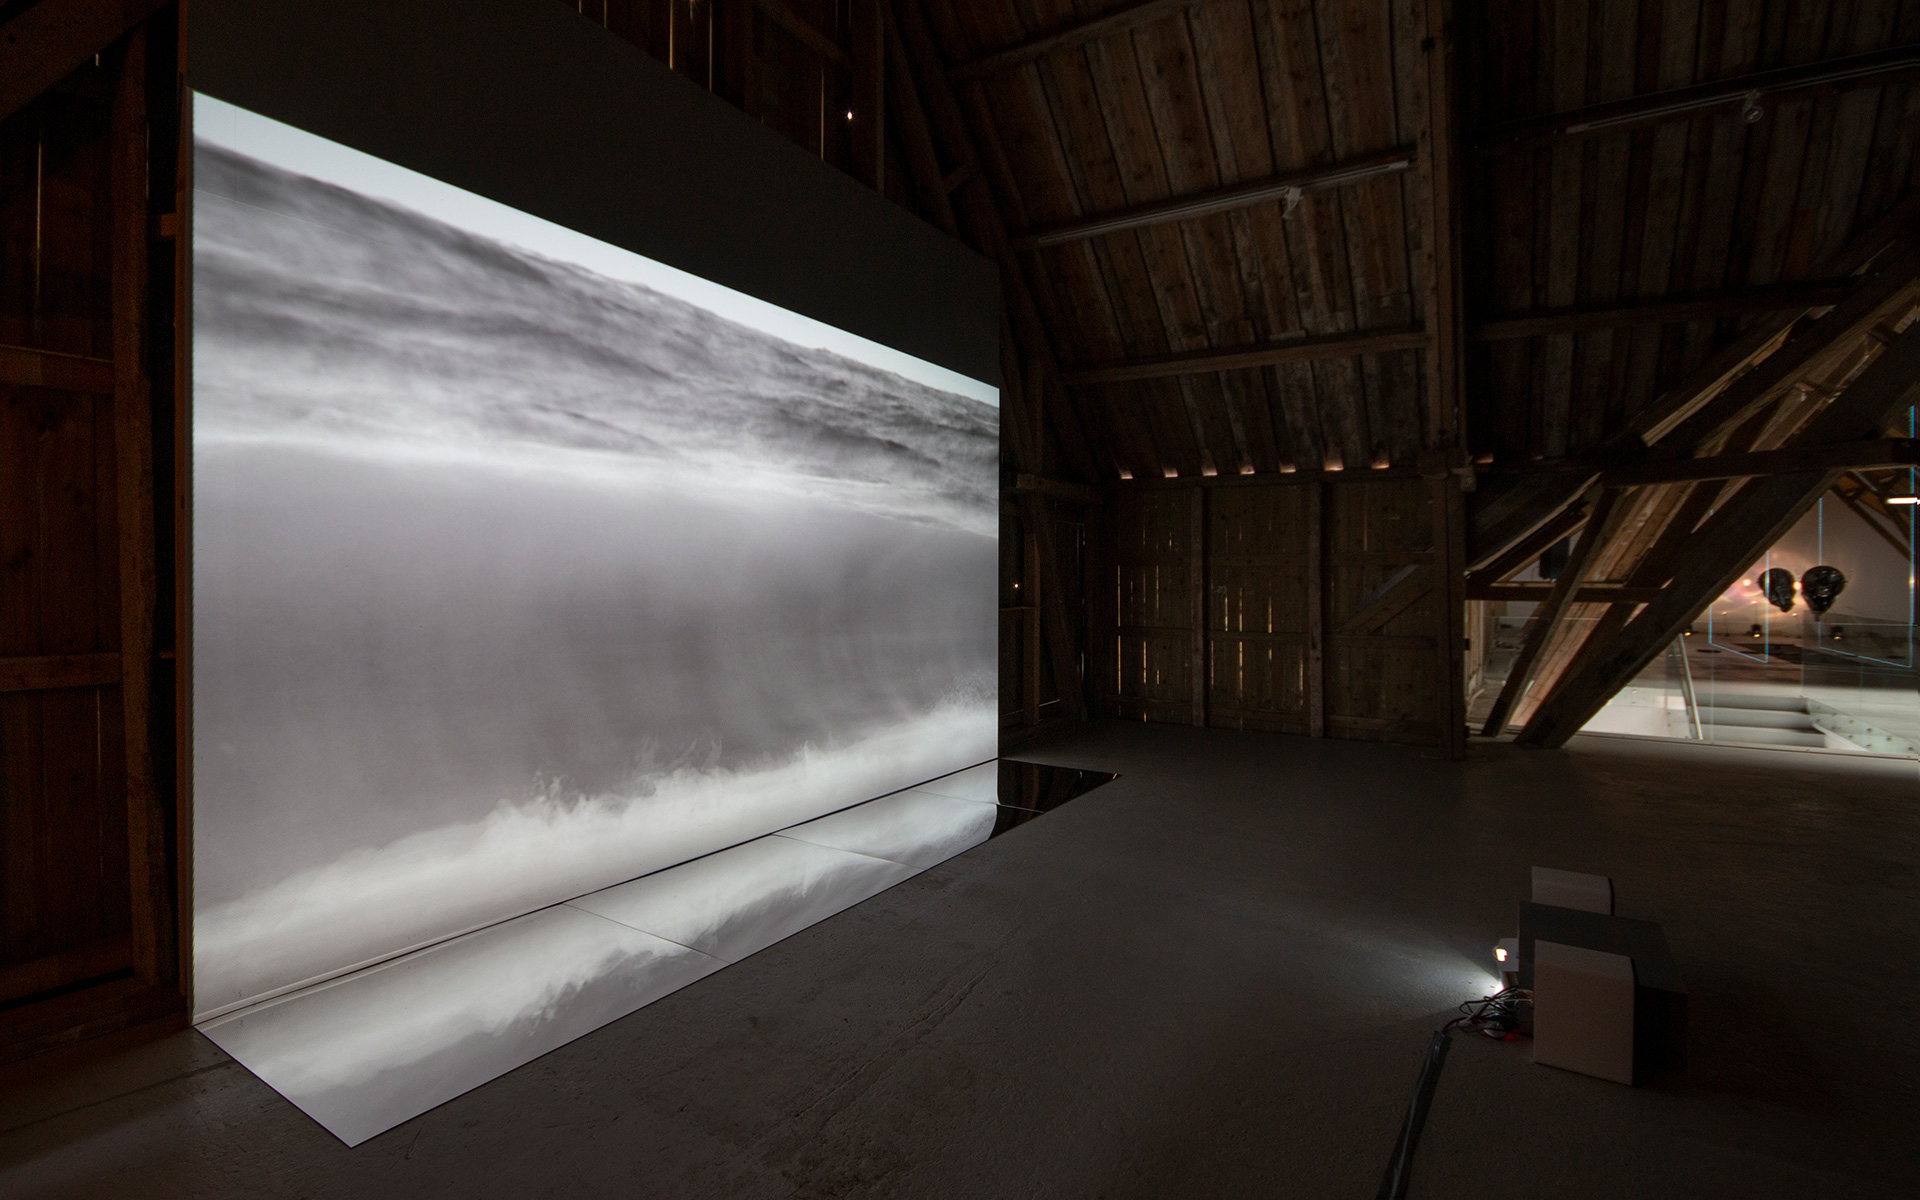 """Flyt"", video 16:9, 22 min loop, speil."